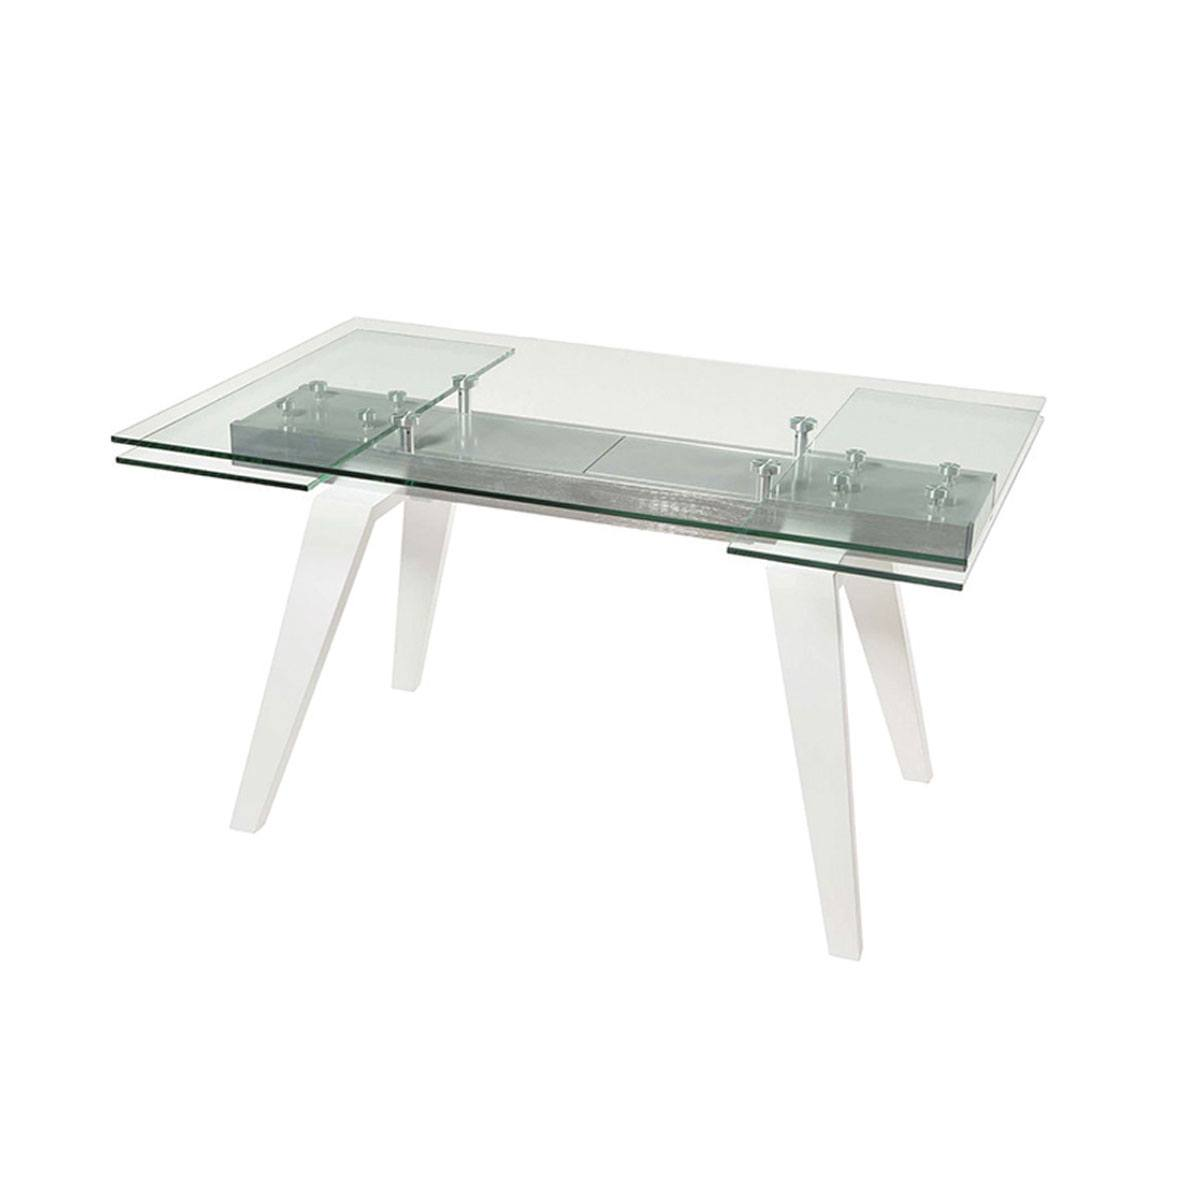 Mesa de comedor extensible 140cm - 210cm. comprar mesas ...